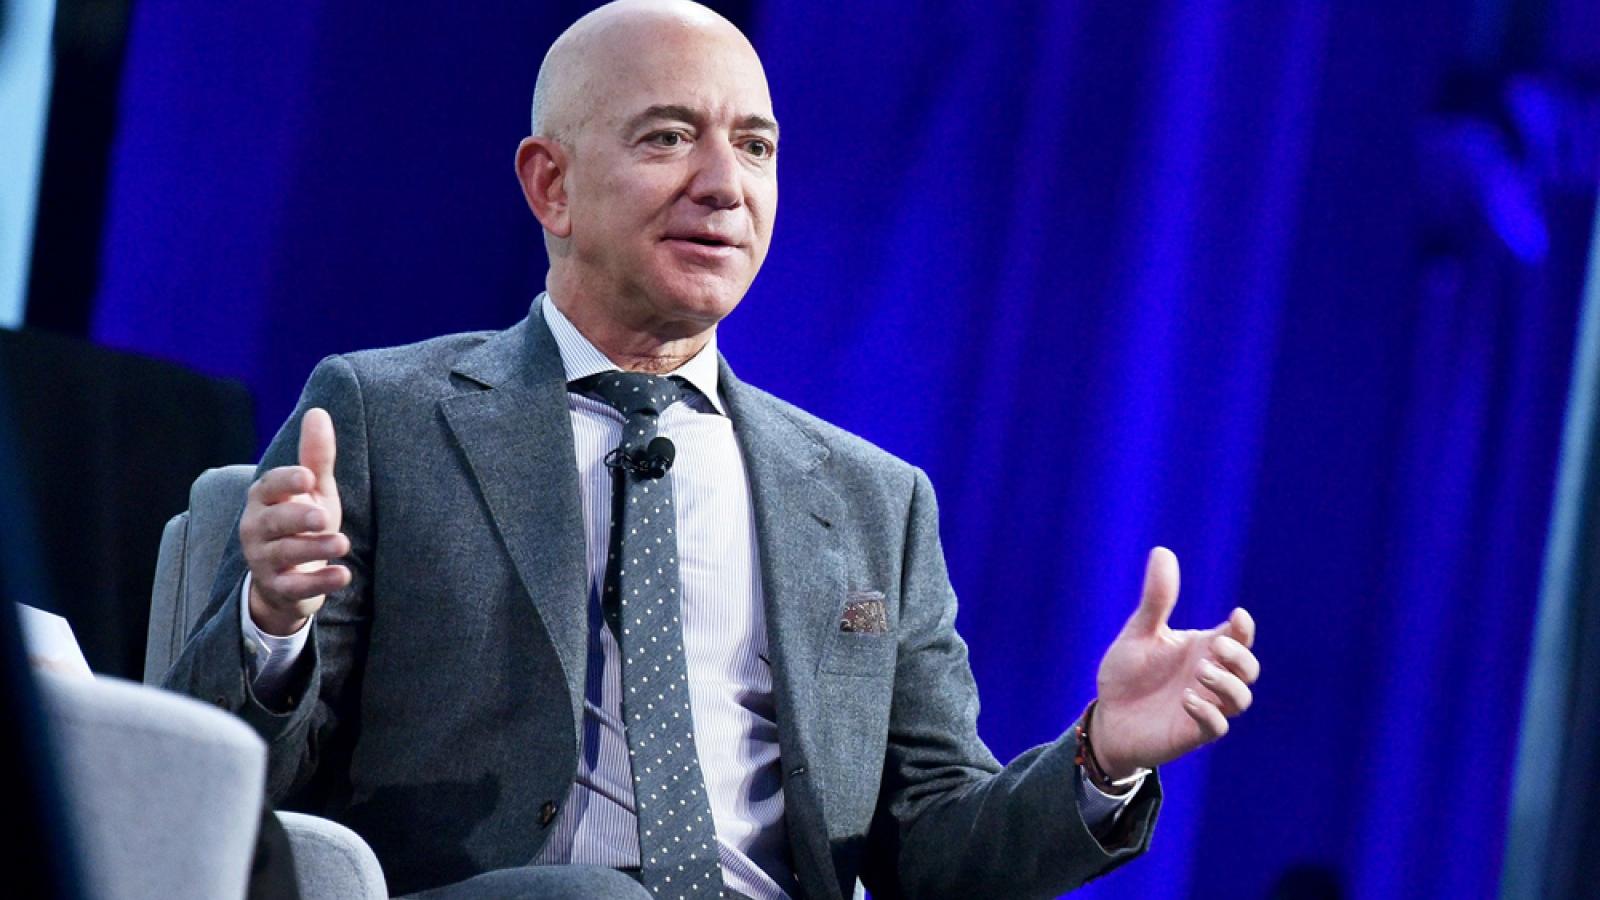 Tỷ phú Jeff Bezos bất ngờ rút khỏi vị trí CEO Amazon